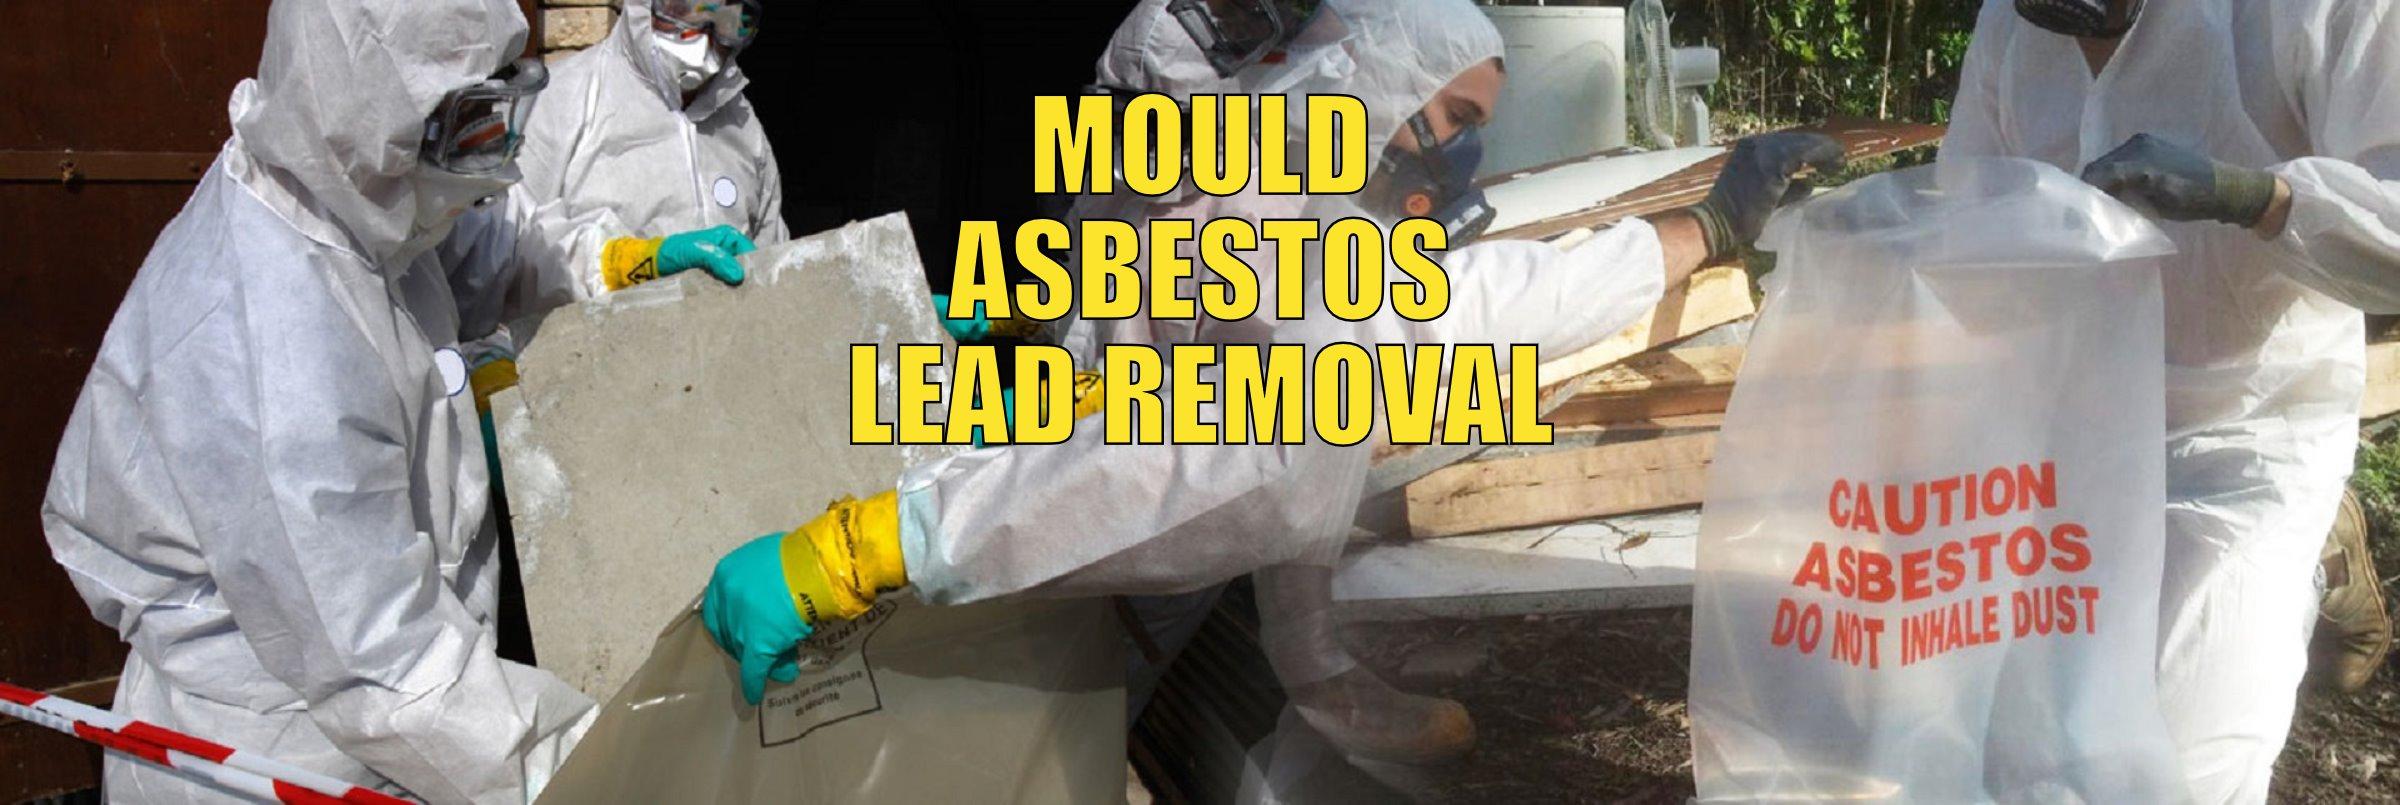 abestos removal services ottawa